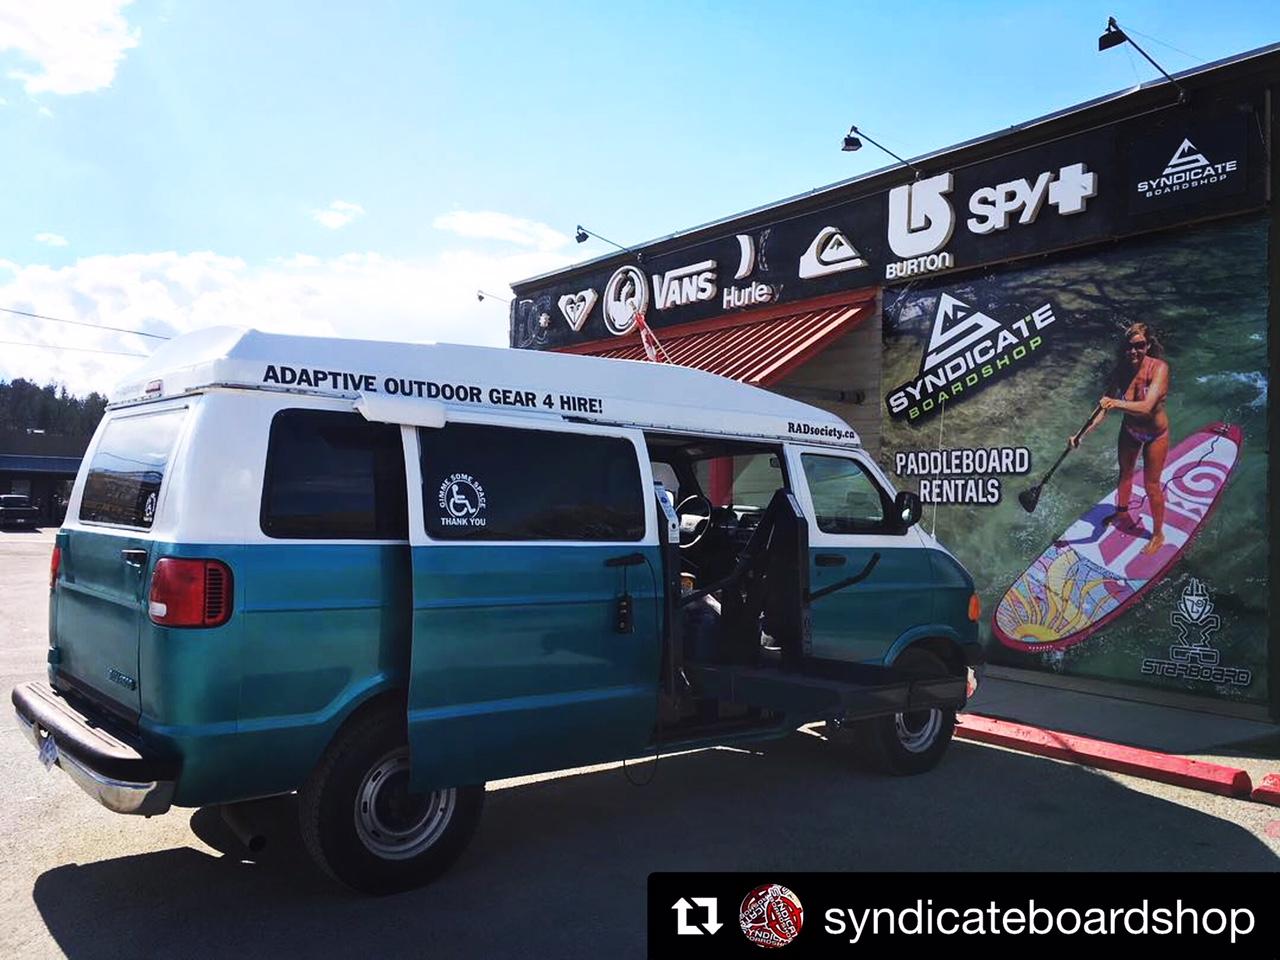 Syndicate Boardshop keeping it RAD!